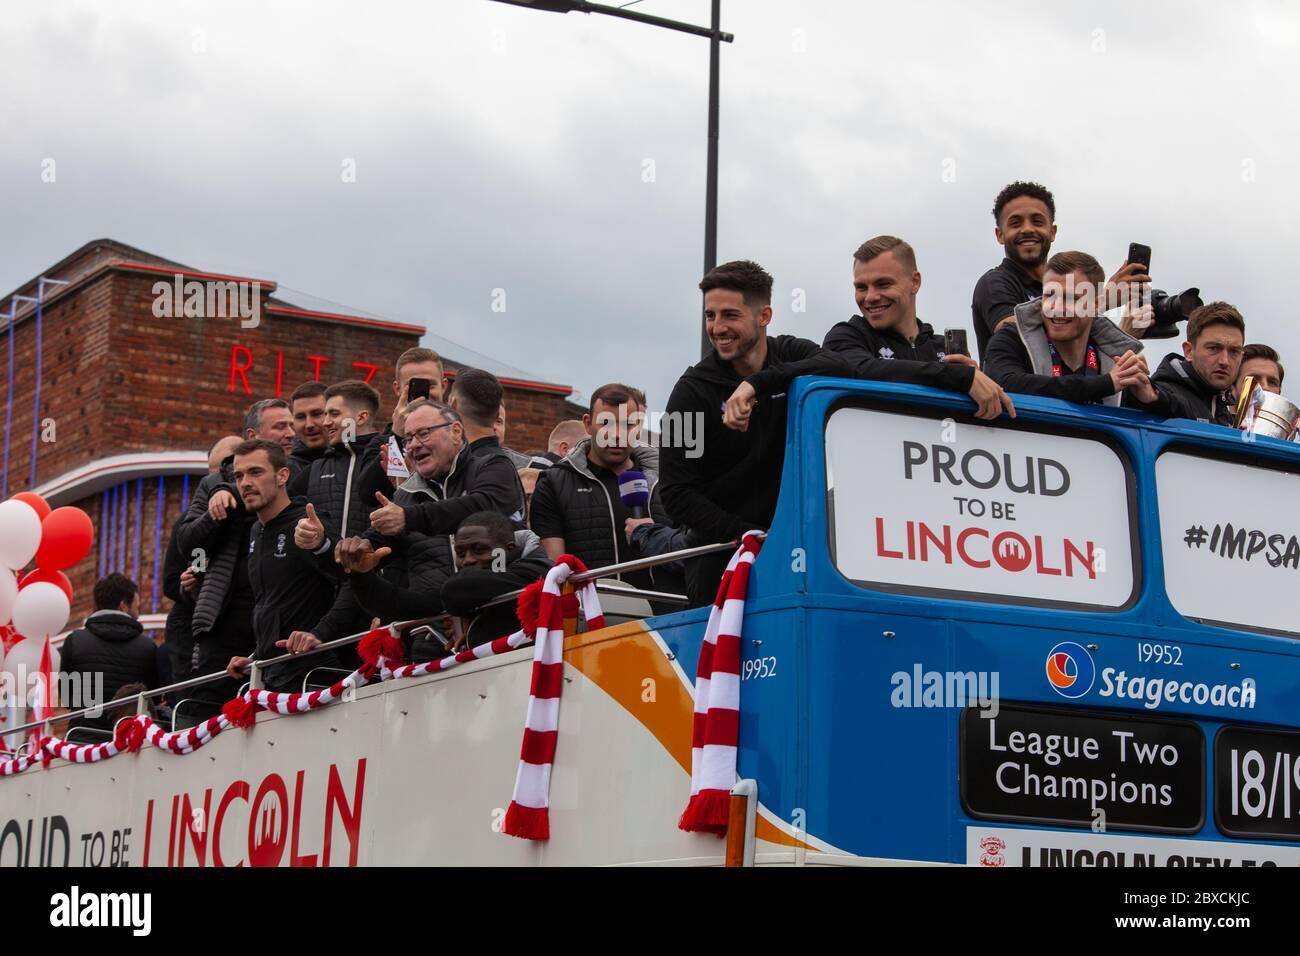 2018/19 Lincoln City Bus tour, premotion bus tour 2019, Imps A One thousands lined the streets, celebration, Imp-ressive Lincoln City., Lincoln FC. Stock Photo